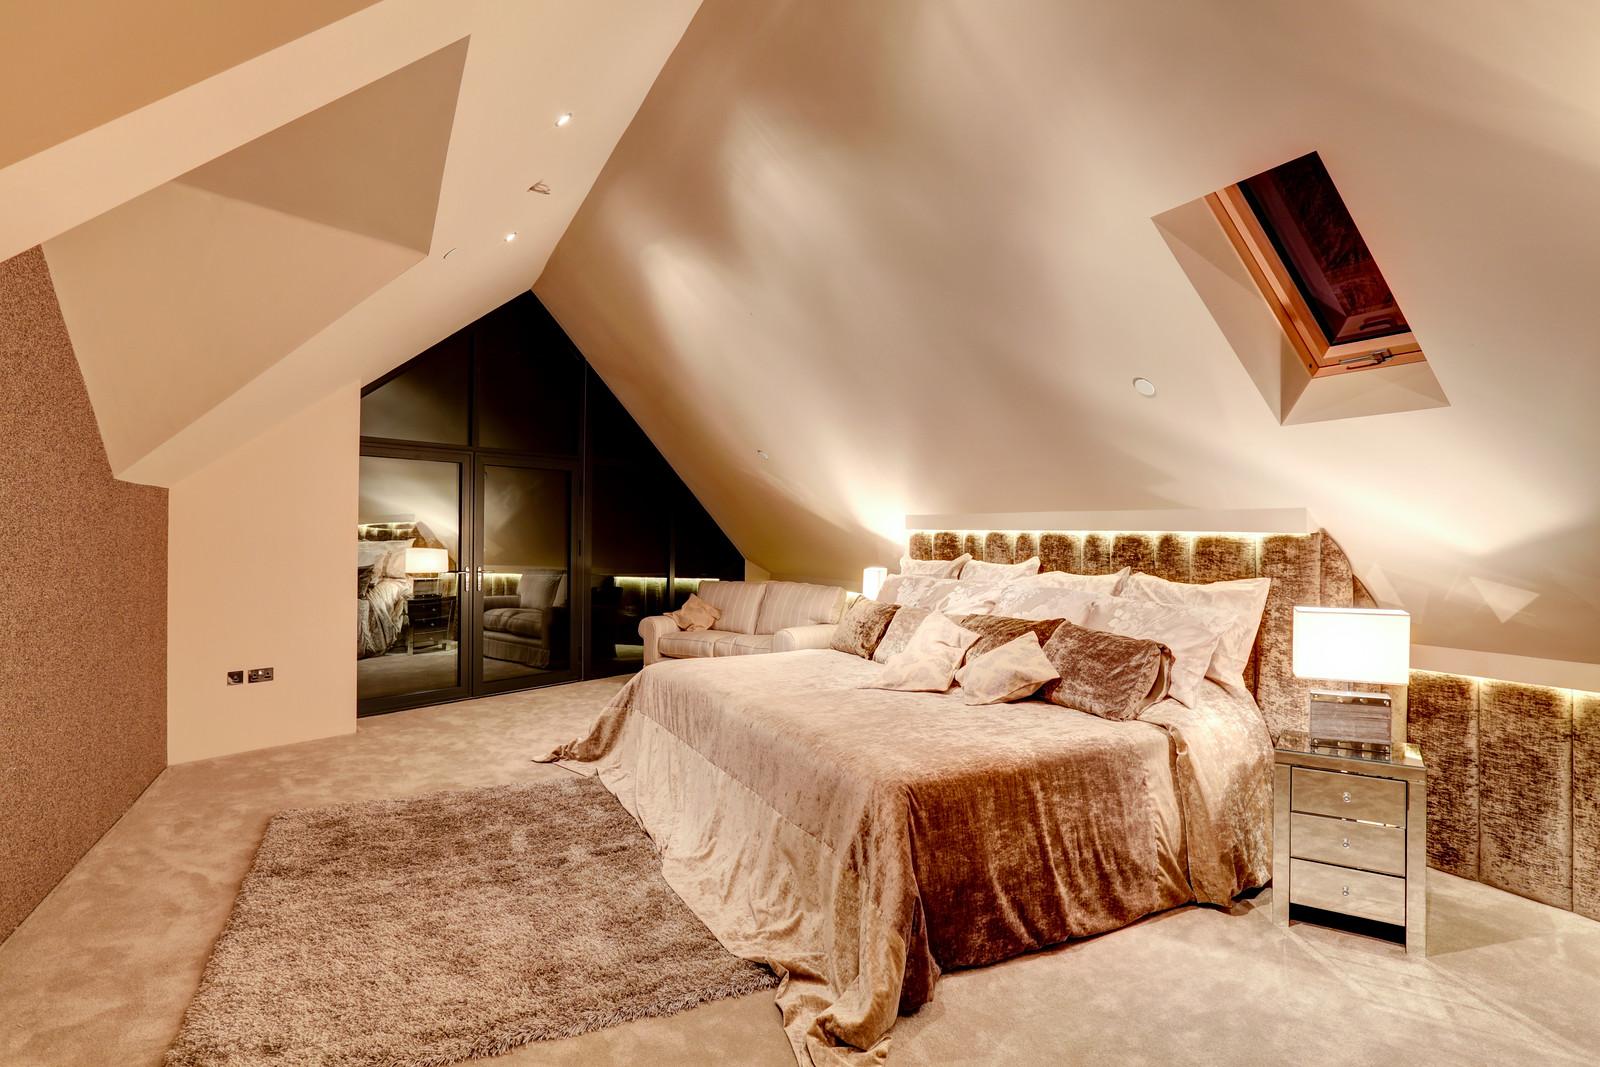 Luxurious bedroom, Tanglewood Nottimghamshire. Luxury home by Guy Phoenix